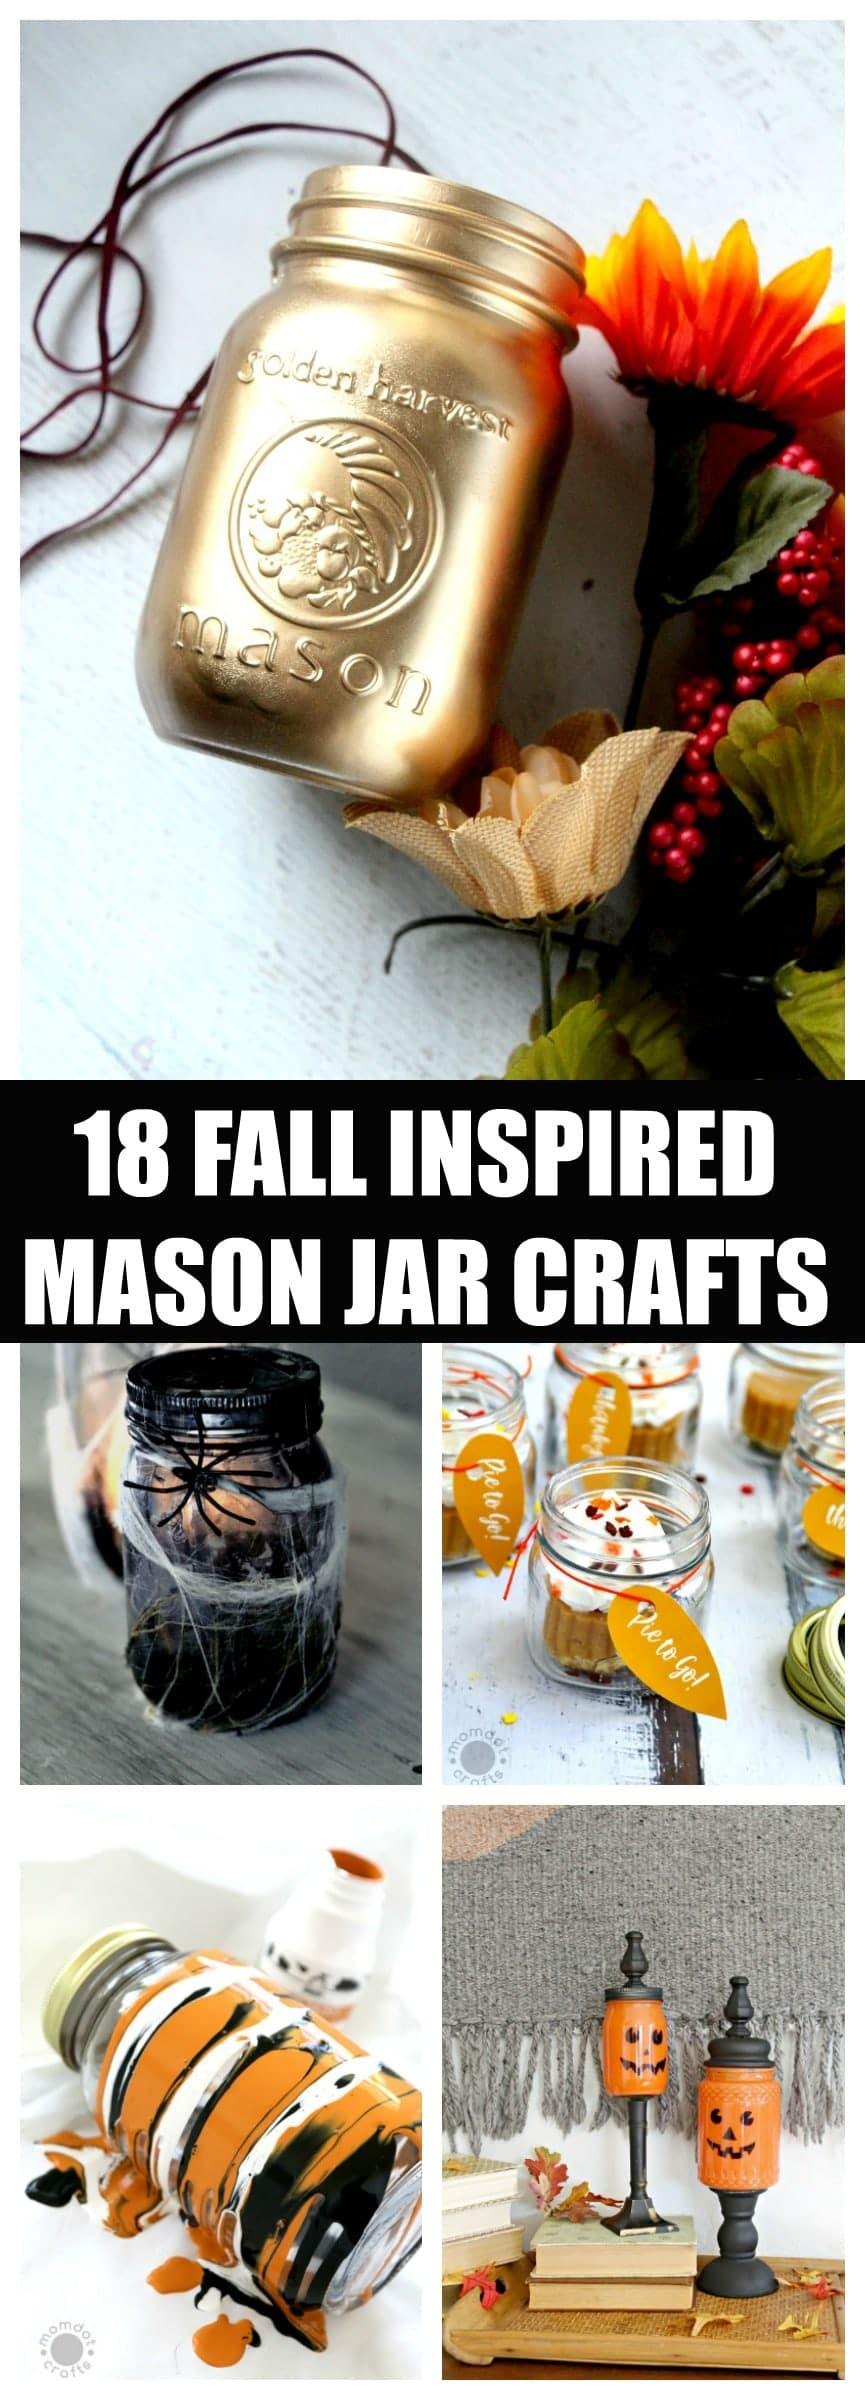 18 Fall Mason Jar Crafts To Inspire You